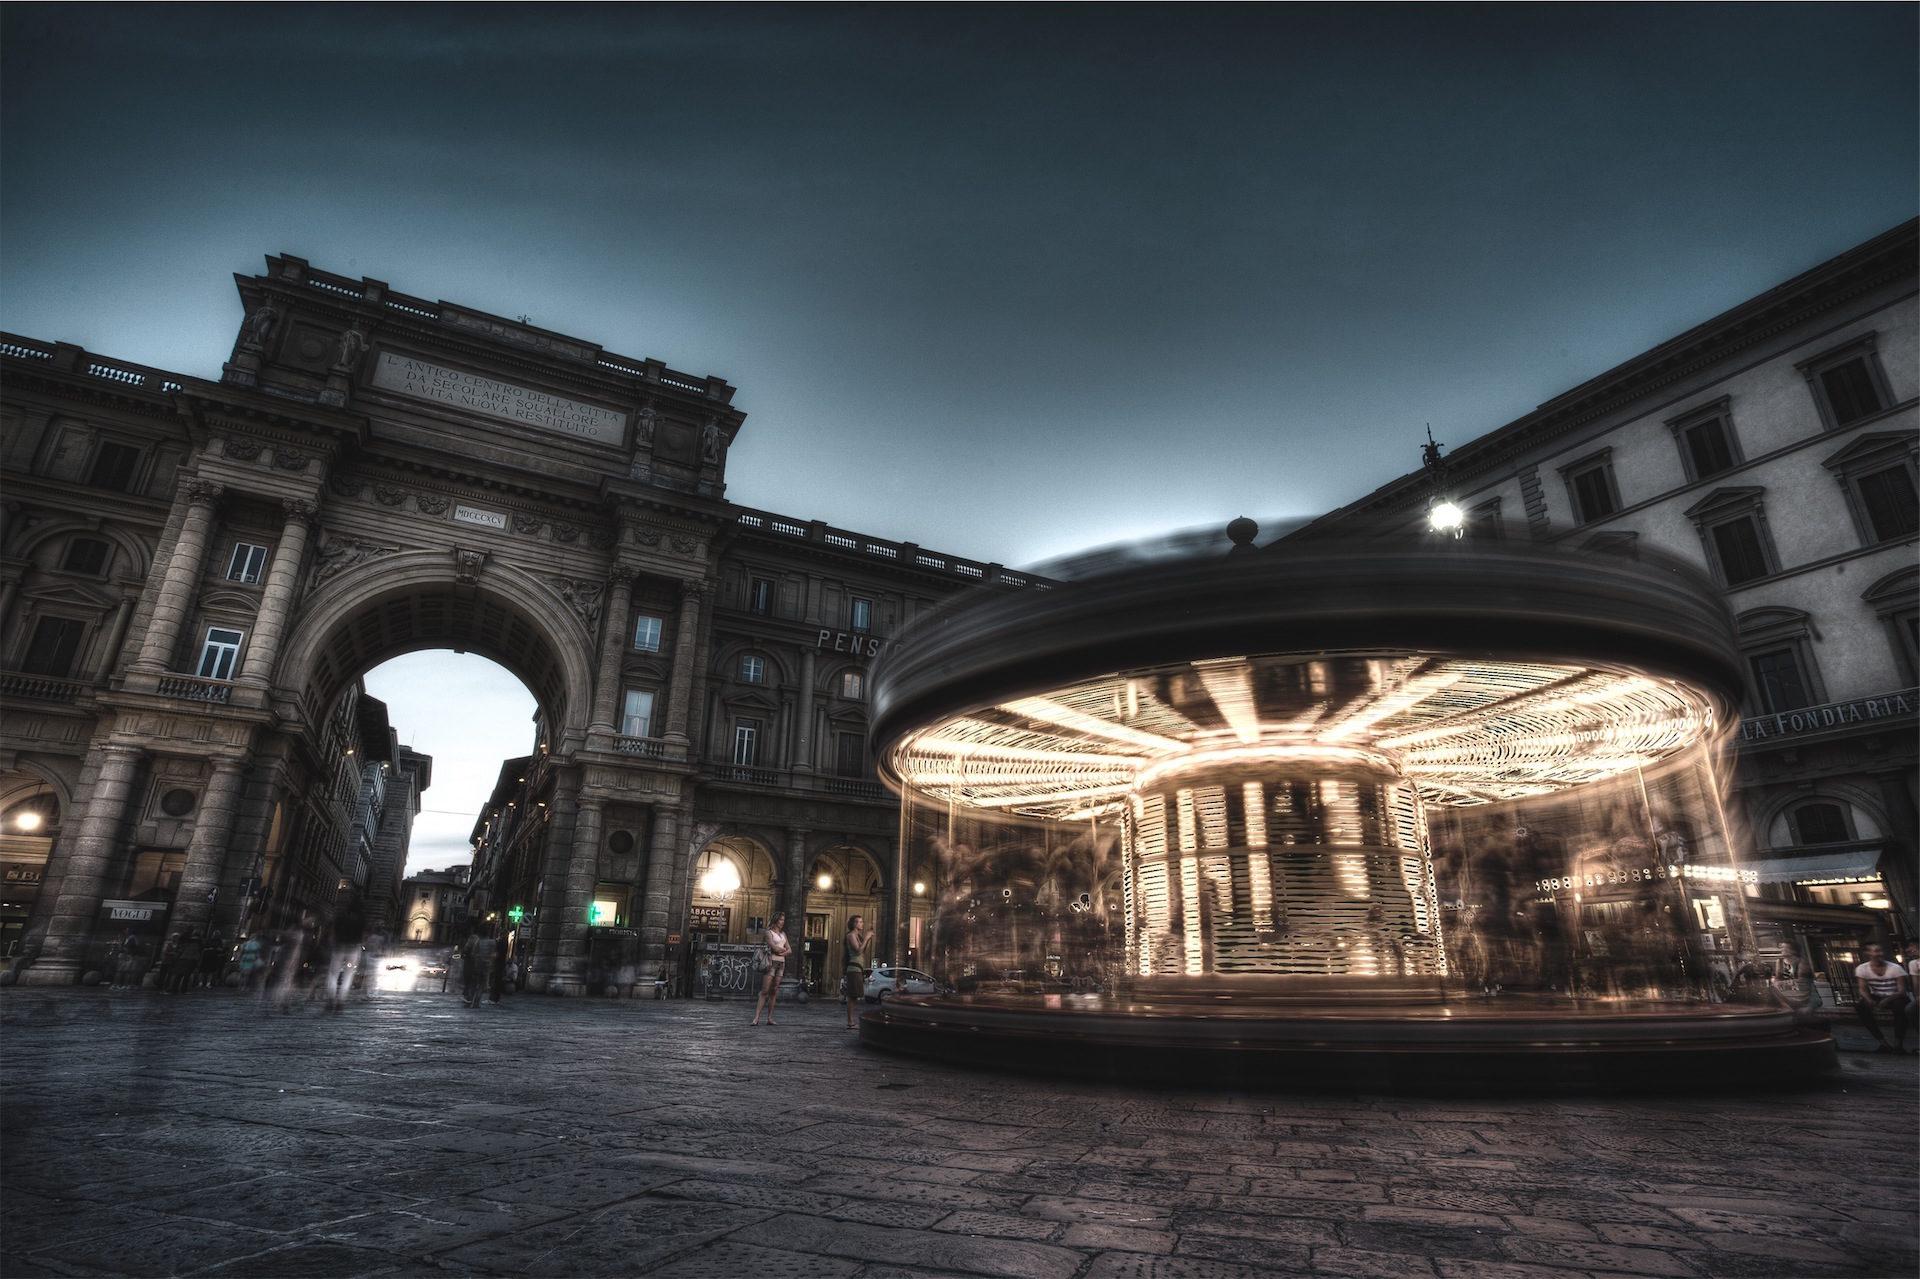 Plaza, αξιοθέατο, φως, κίνηση, κτίρια - Wallpapers HD - Professor-falken.com